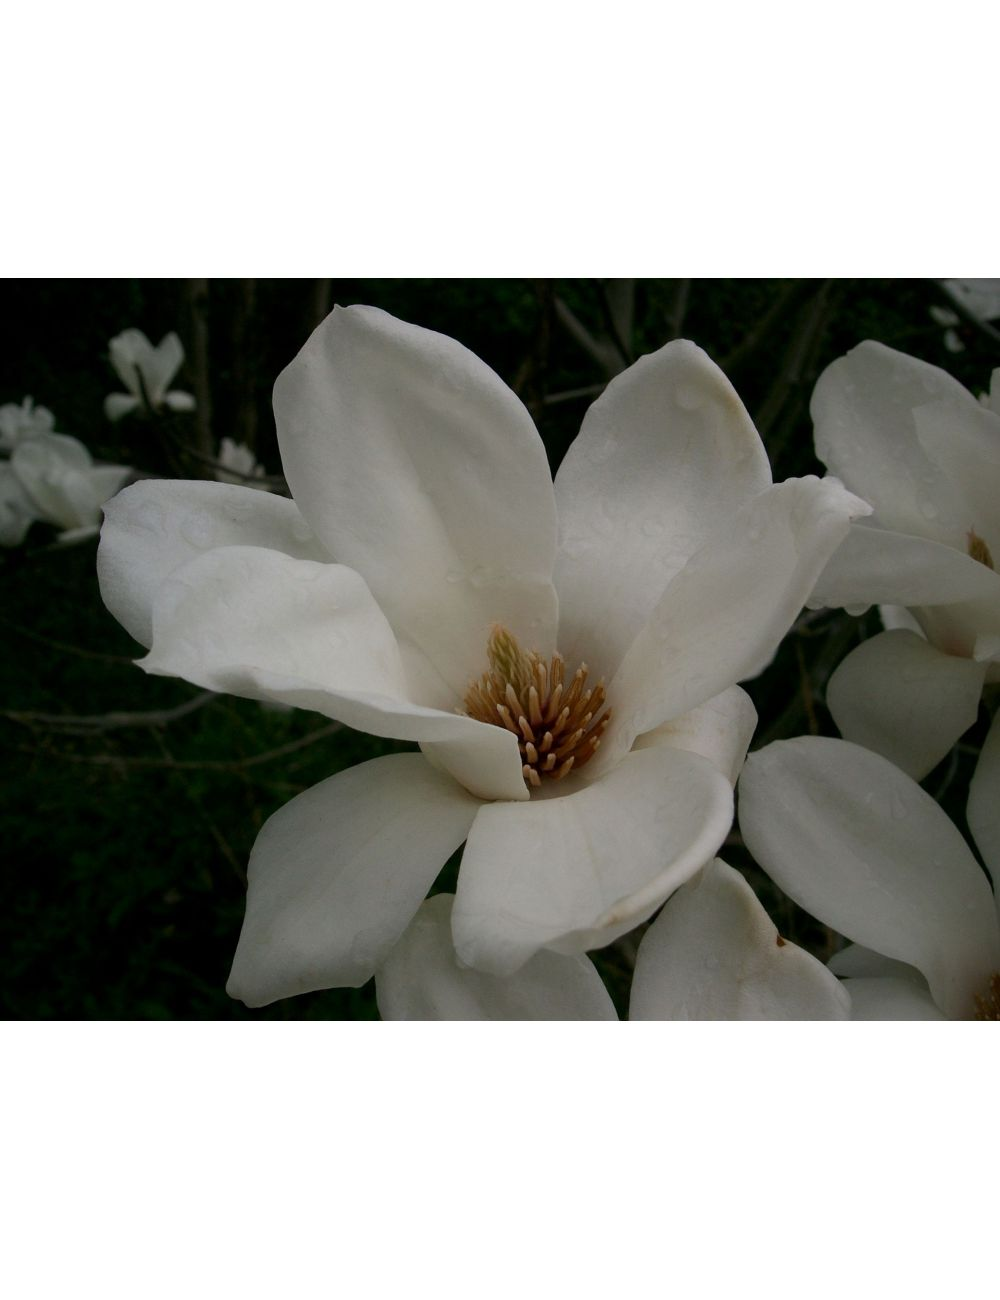 Clematis Resistenti Al Freddo magnolia yulan vaso 24 cm - vendita on line - solopiante.it